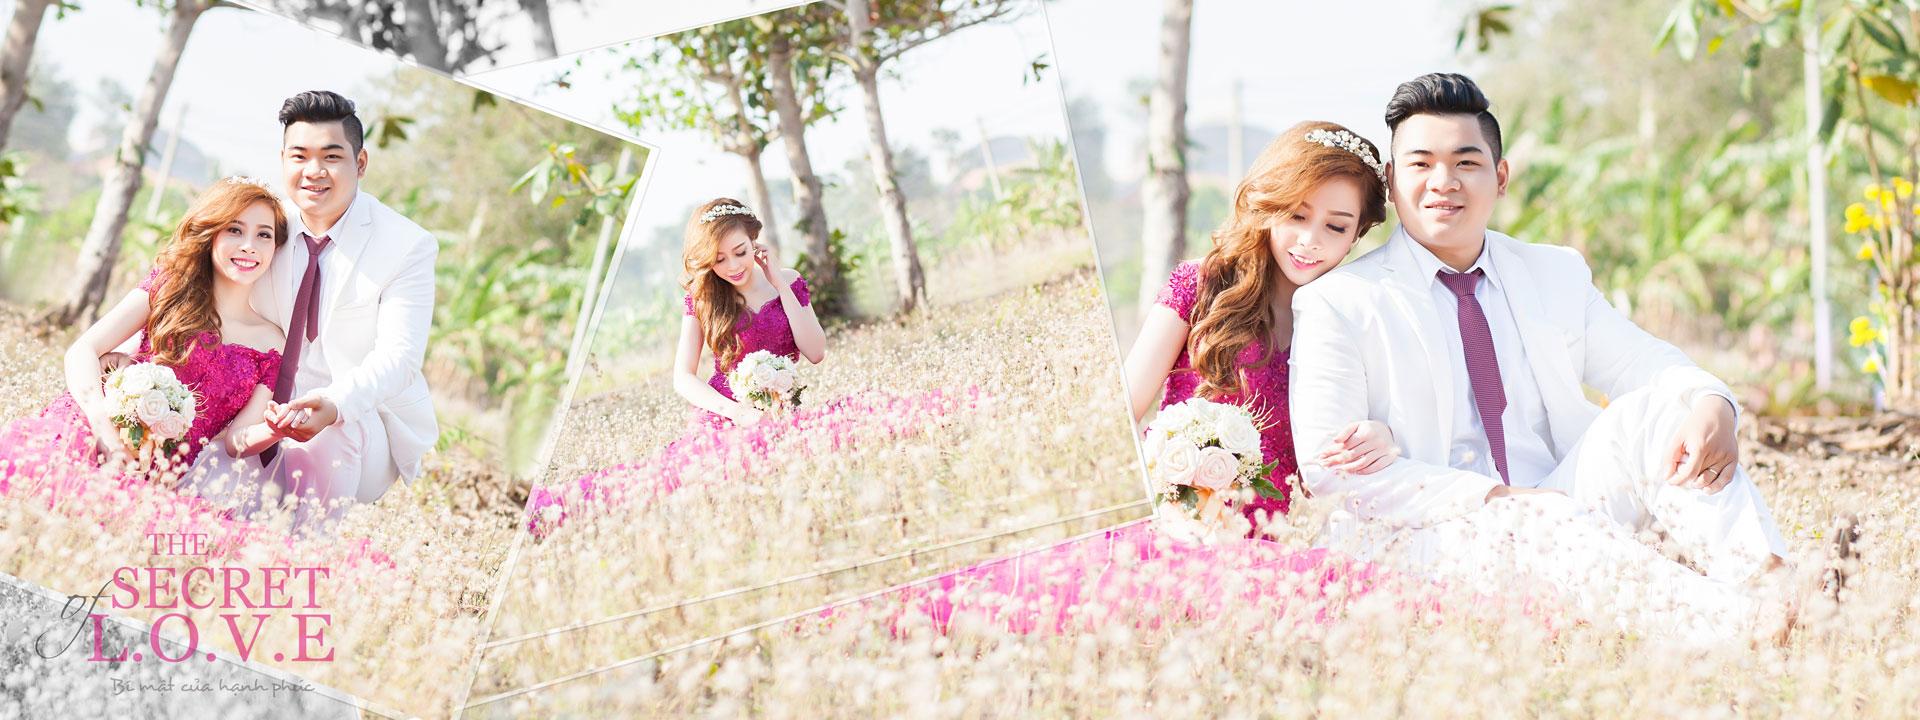 Album Ngoai Canh Ho Coc Nhan & Huong